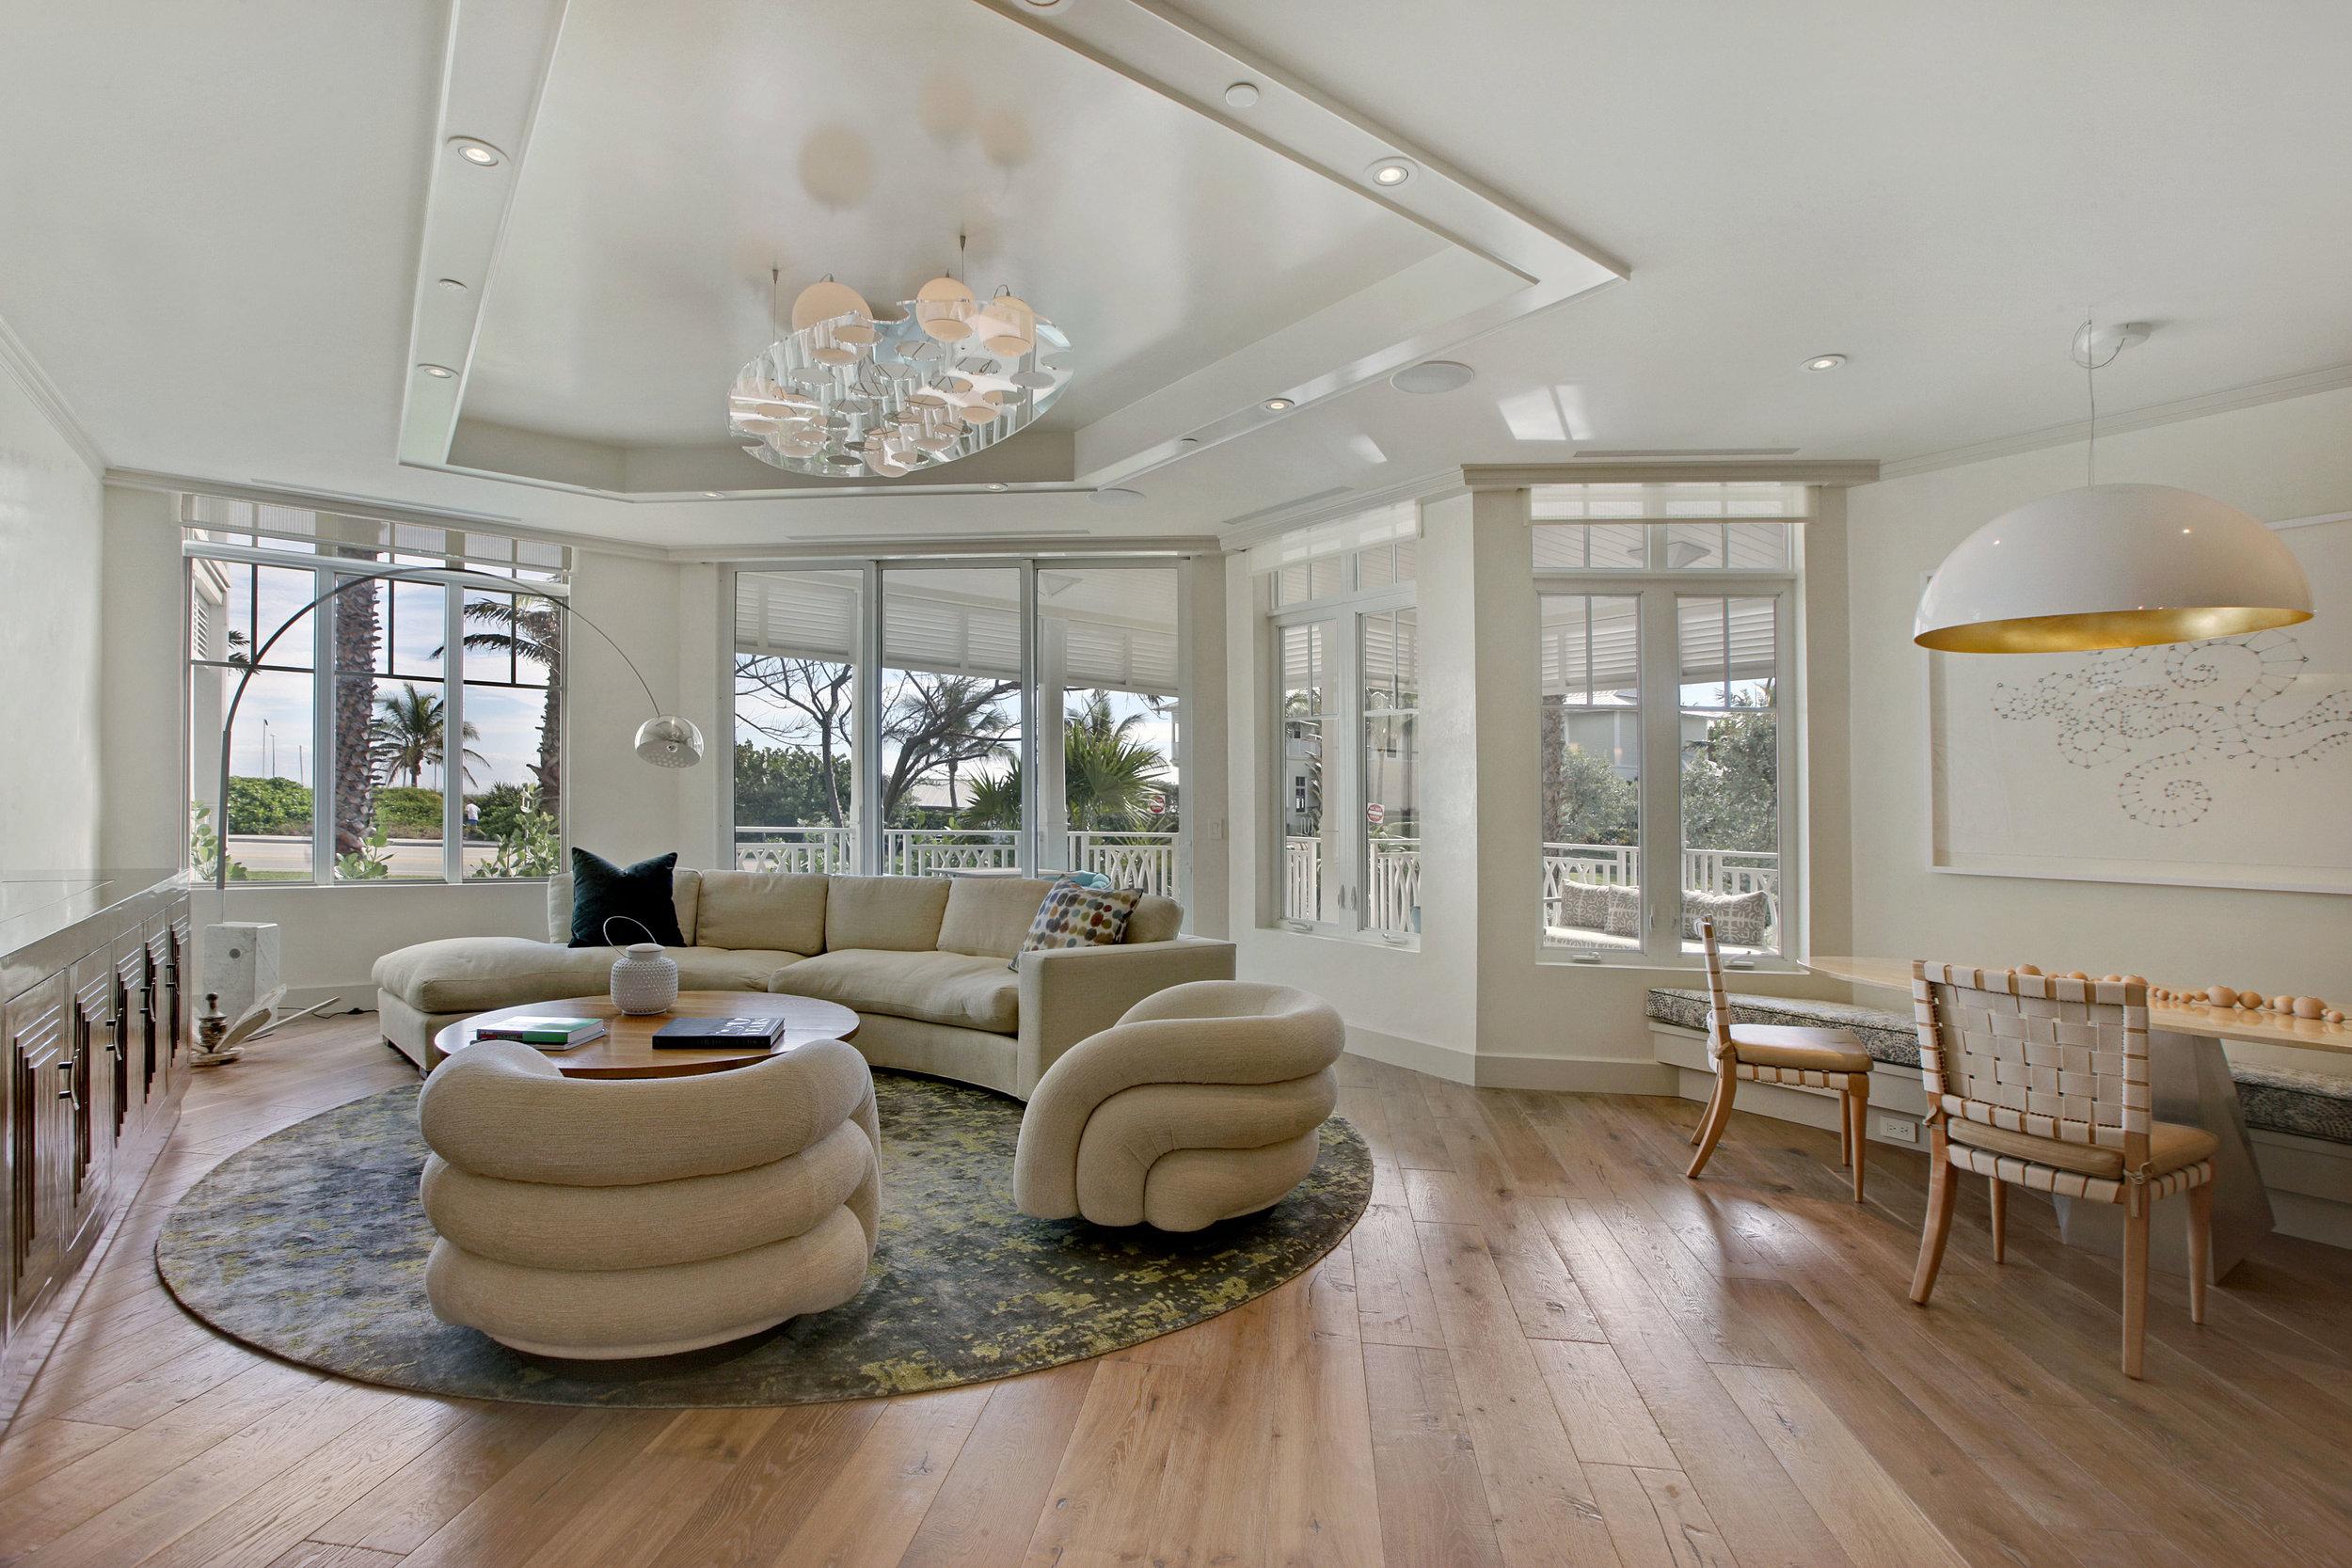 Custom Condominium | Delray Beach, FL  Architect | Randall Stofft  Interior Designer |Tricia Huntley   View Project